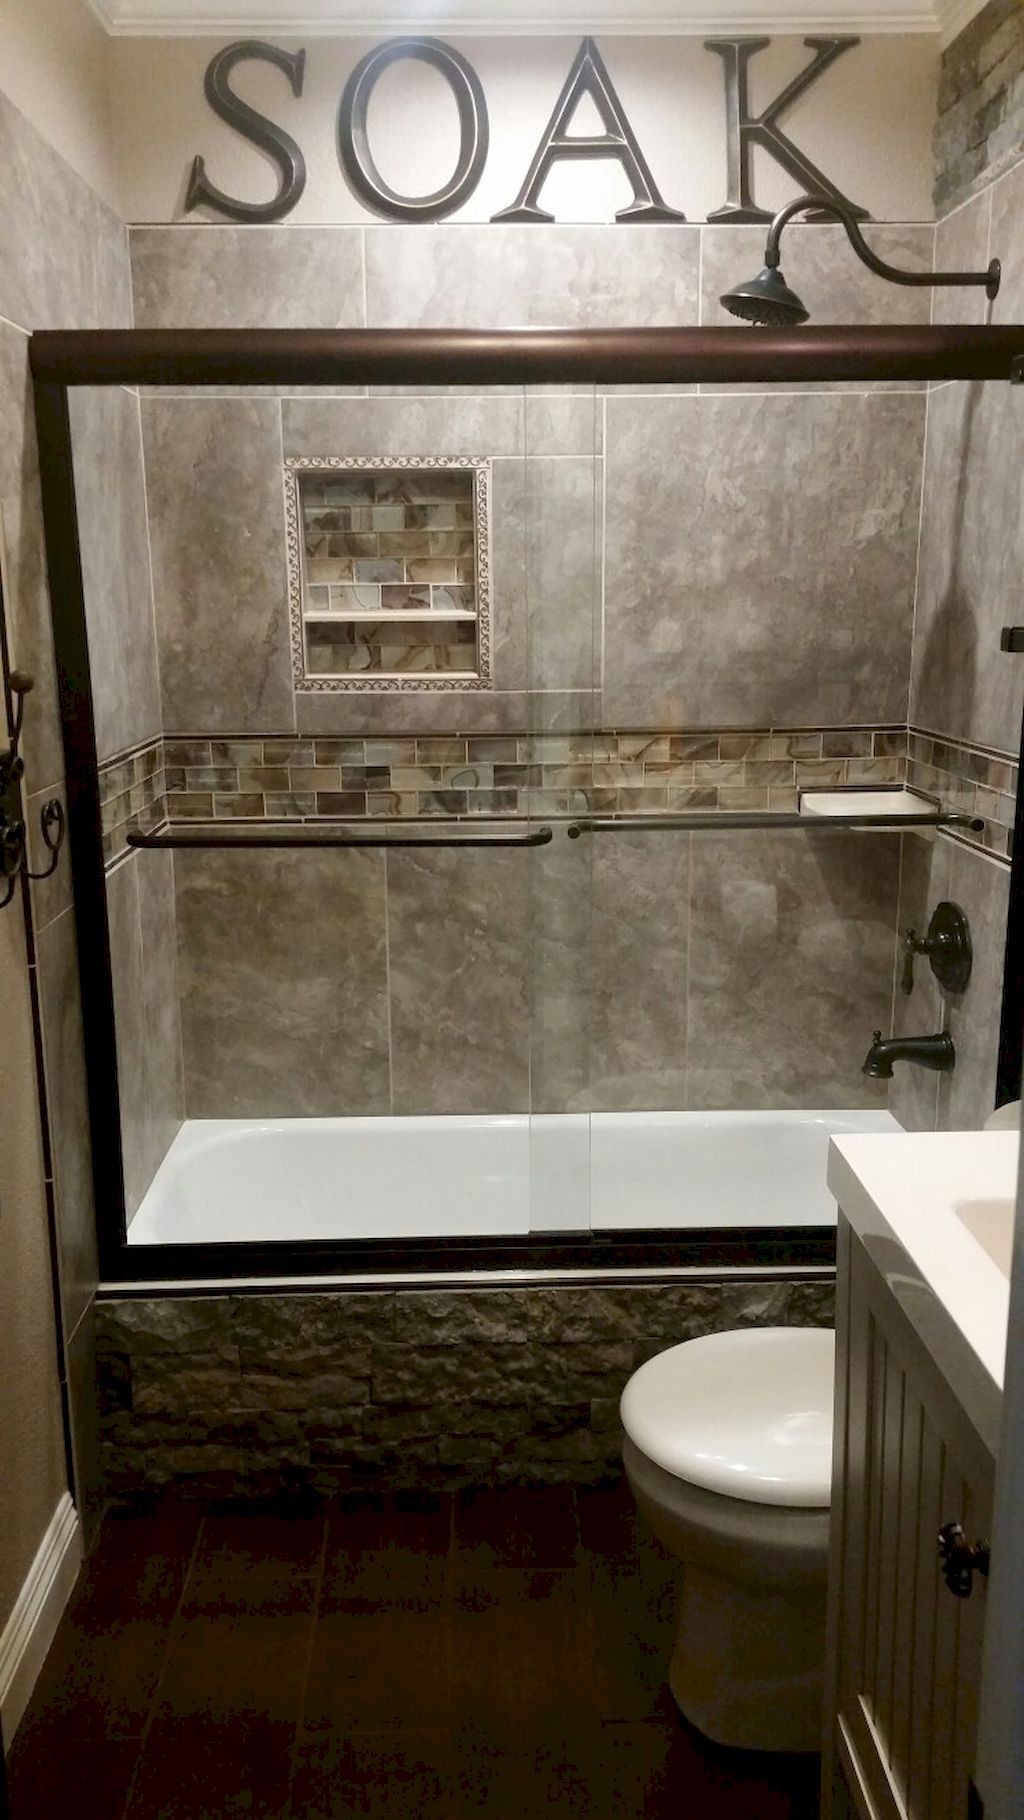 Bathroom Remodel Gorgeous 55 Cool Little Master Bathroom Remodeling Ideas https://homeastern.com/2017/06/23/55-cool-small-master-bathroom-remodel-ideas/ GFIDNCG